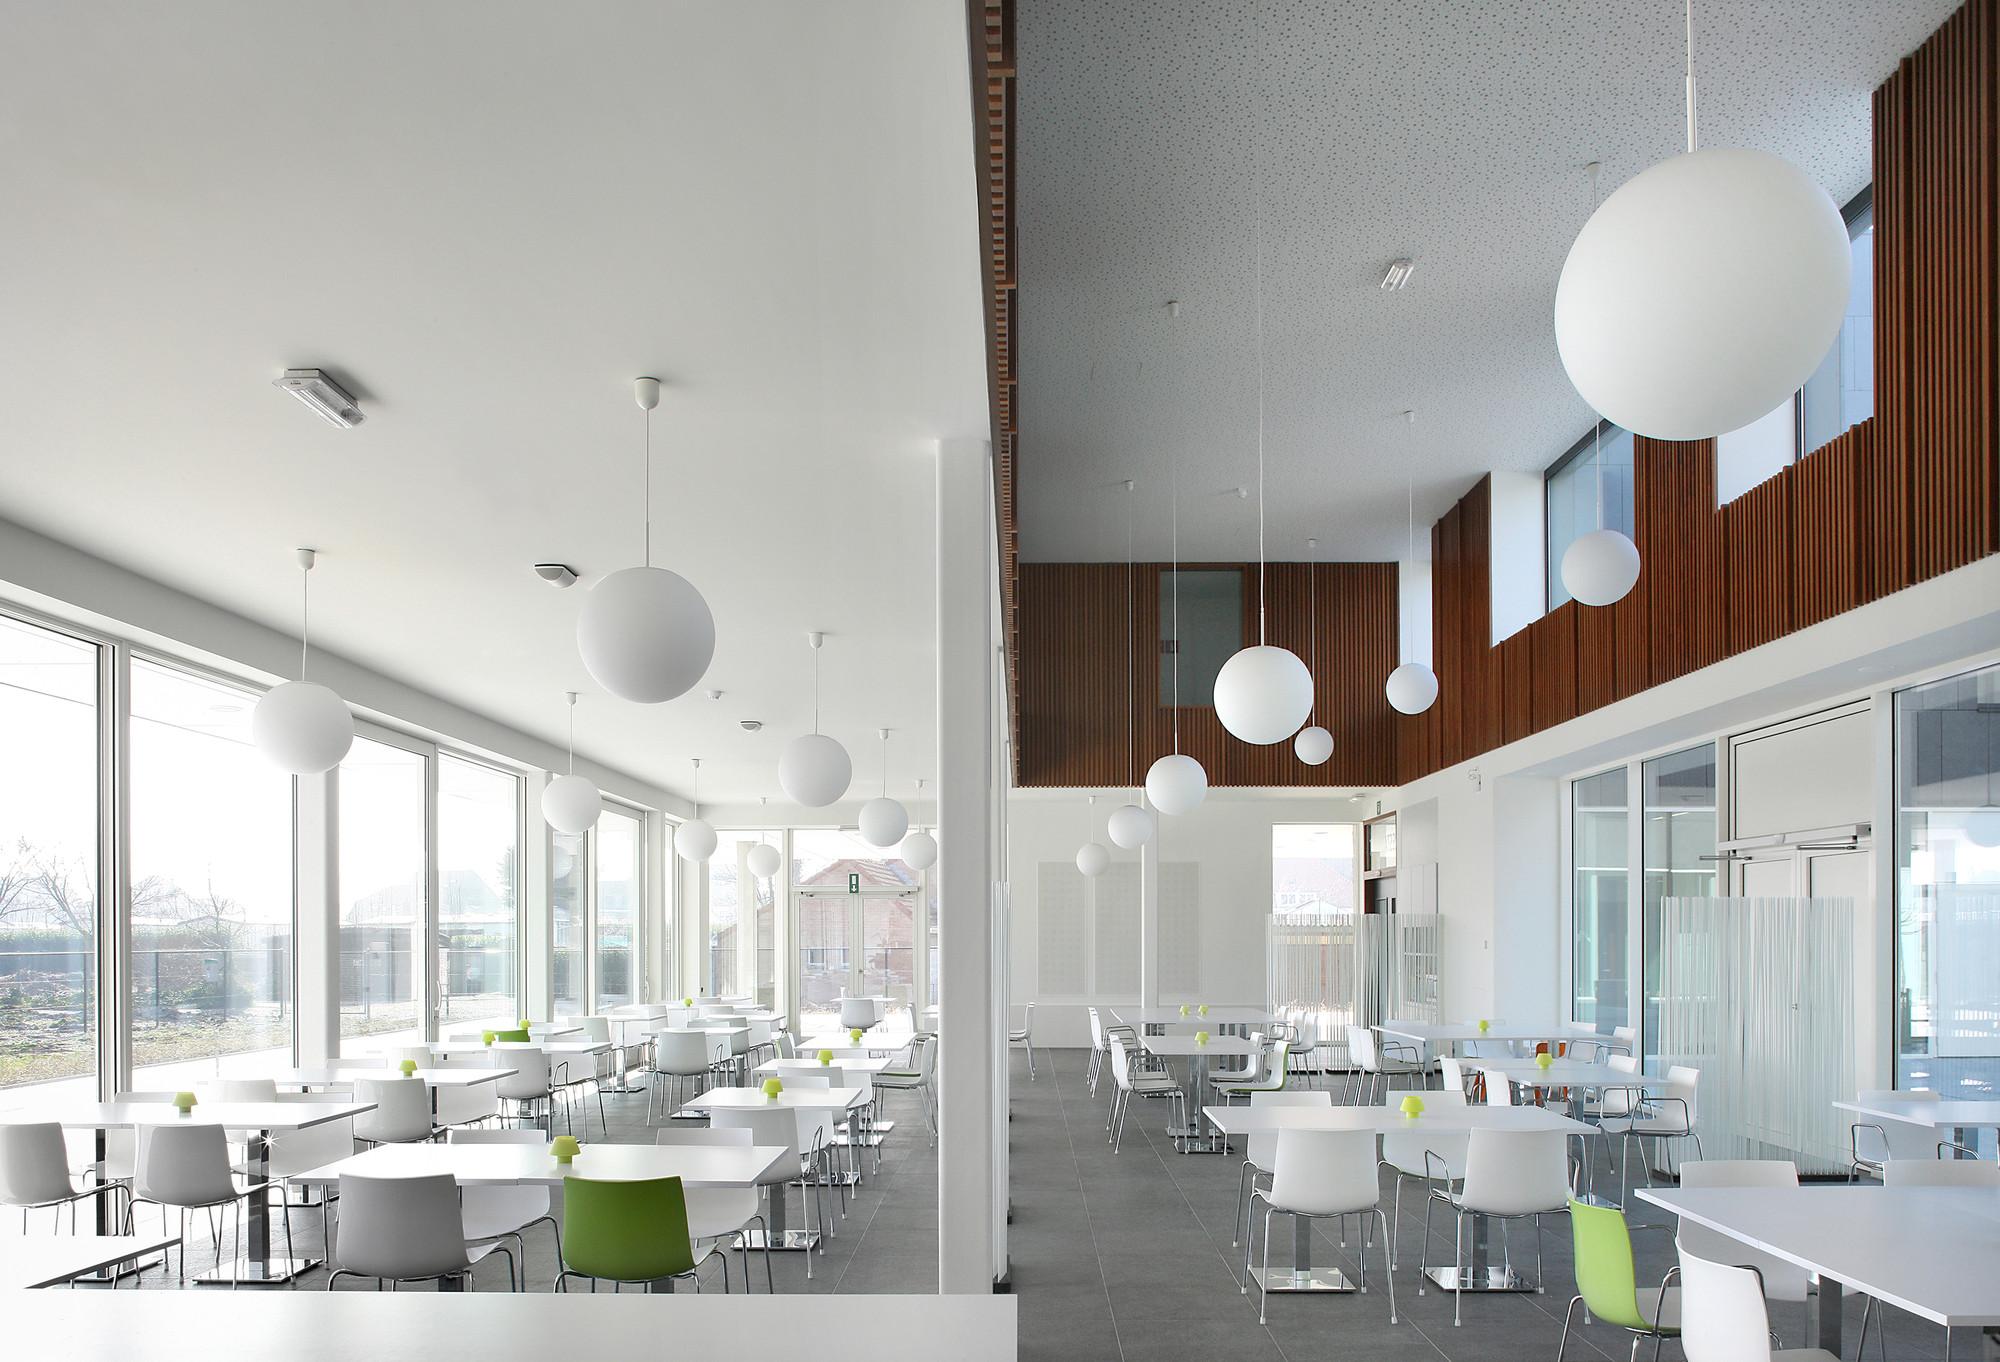 Carehotel middelpunt architectuuratelier dertien12 for Dujardin 007